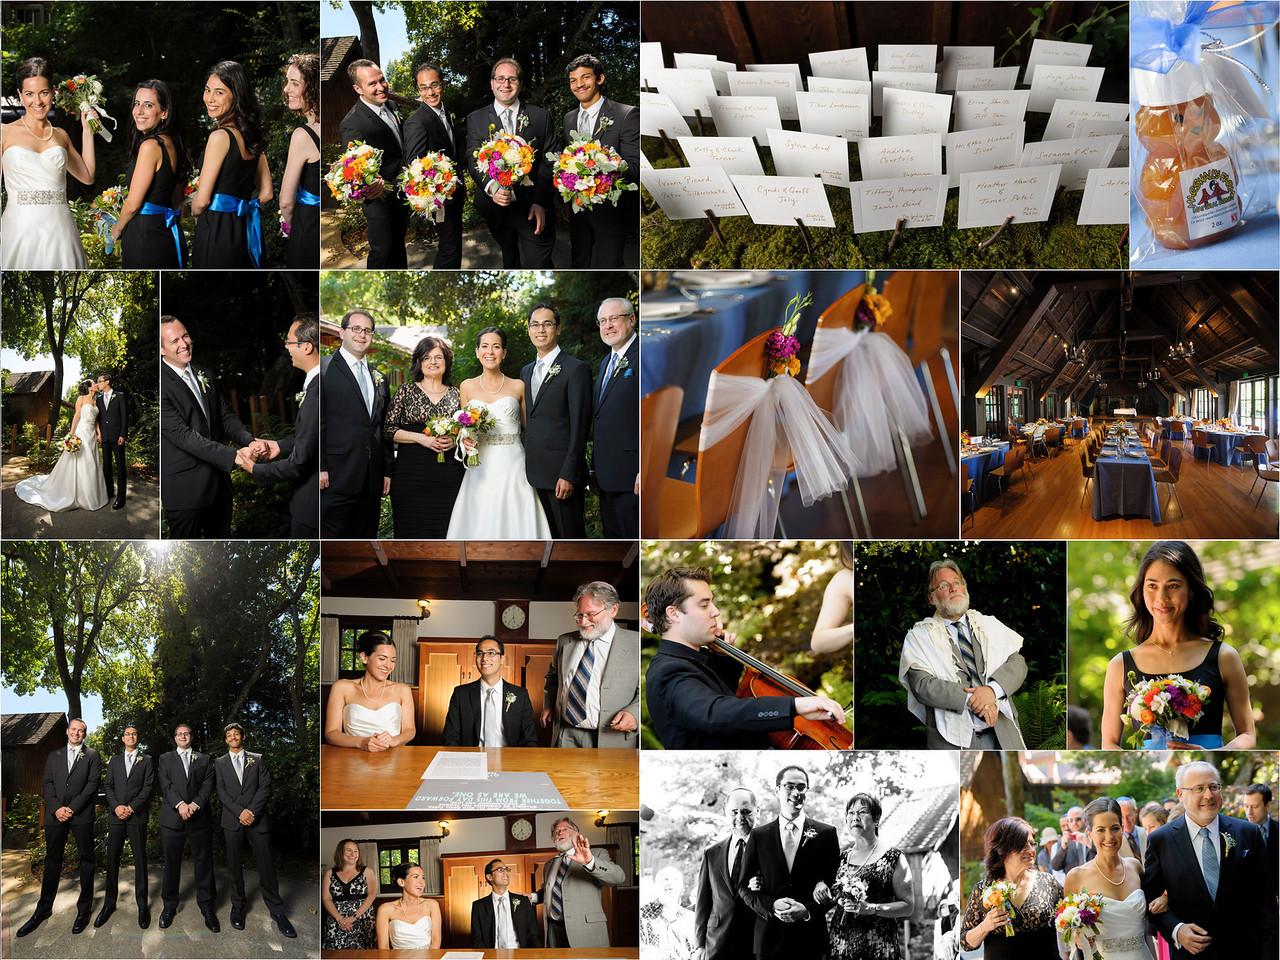 Alyssa_and_Paul_Wedding_Photography_4x6_Photo_Board_04